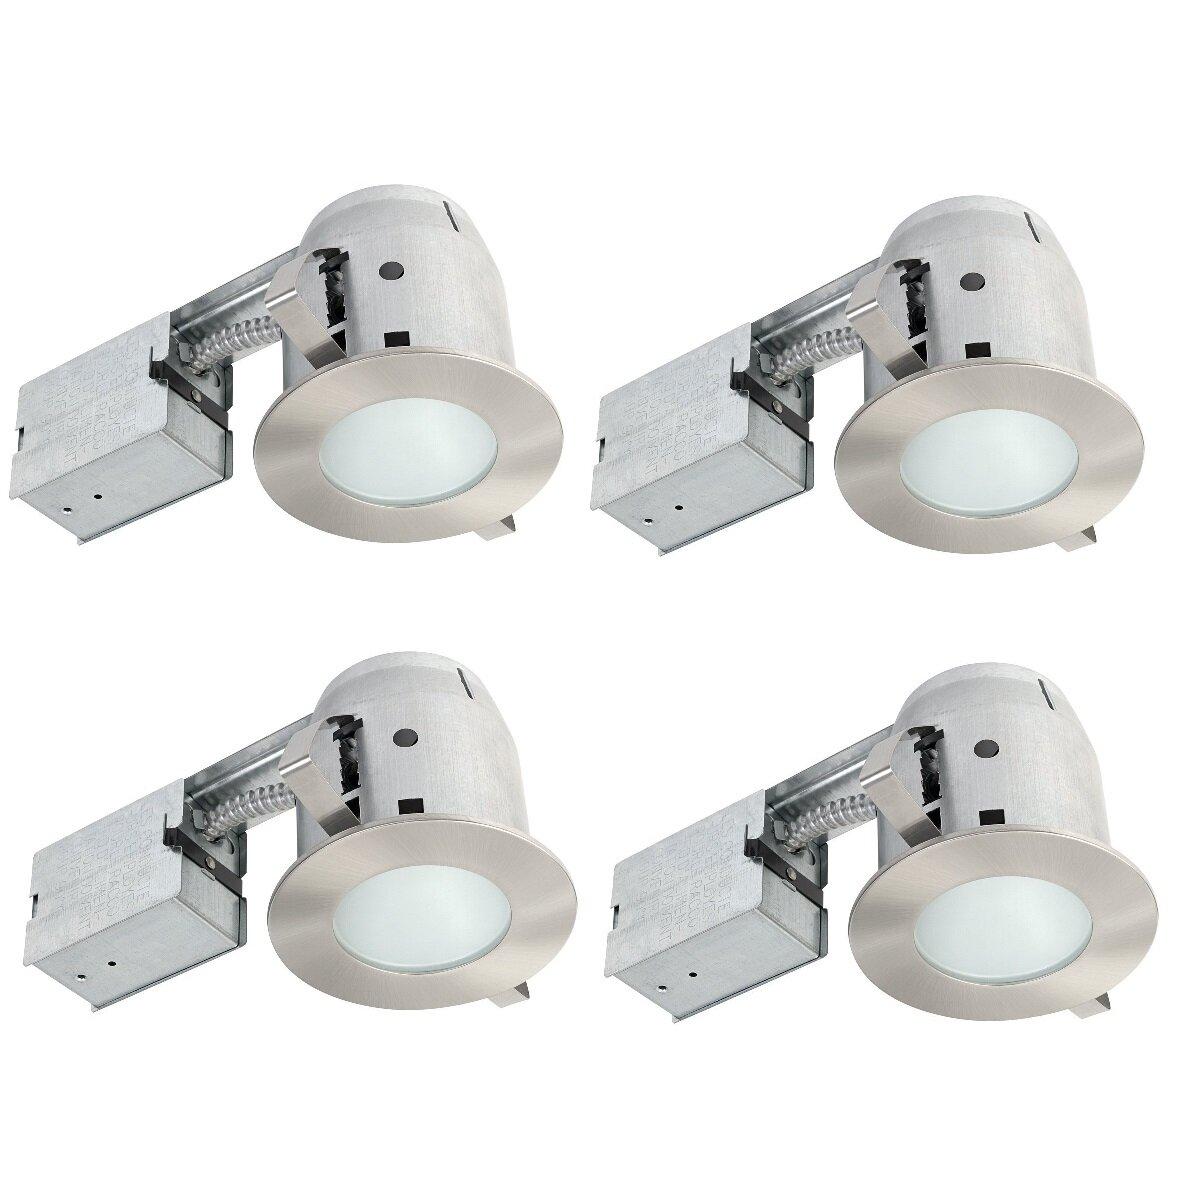 "Globe Electric Company IC Rated Bathroom Lighting 4"" LED ..."